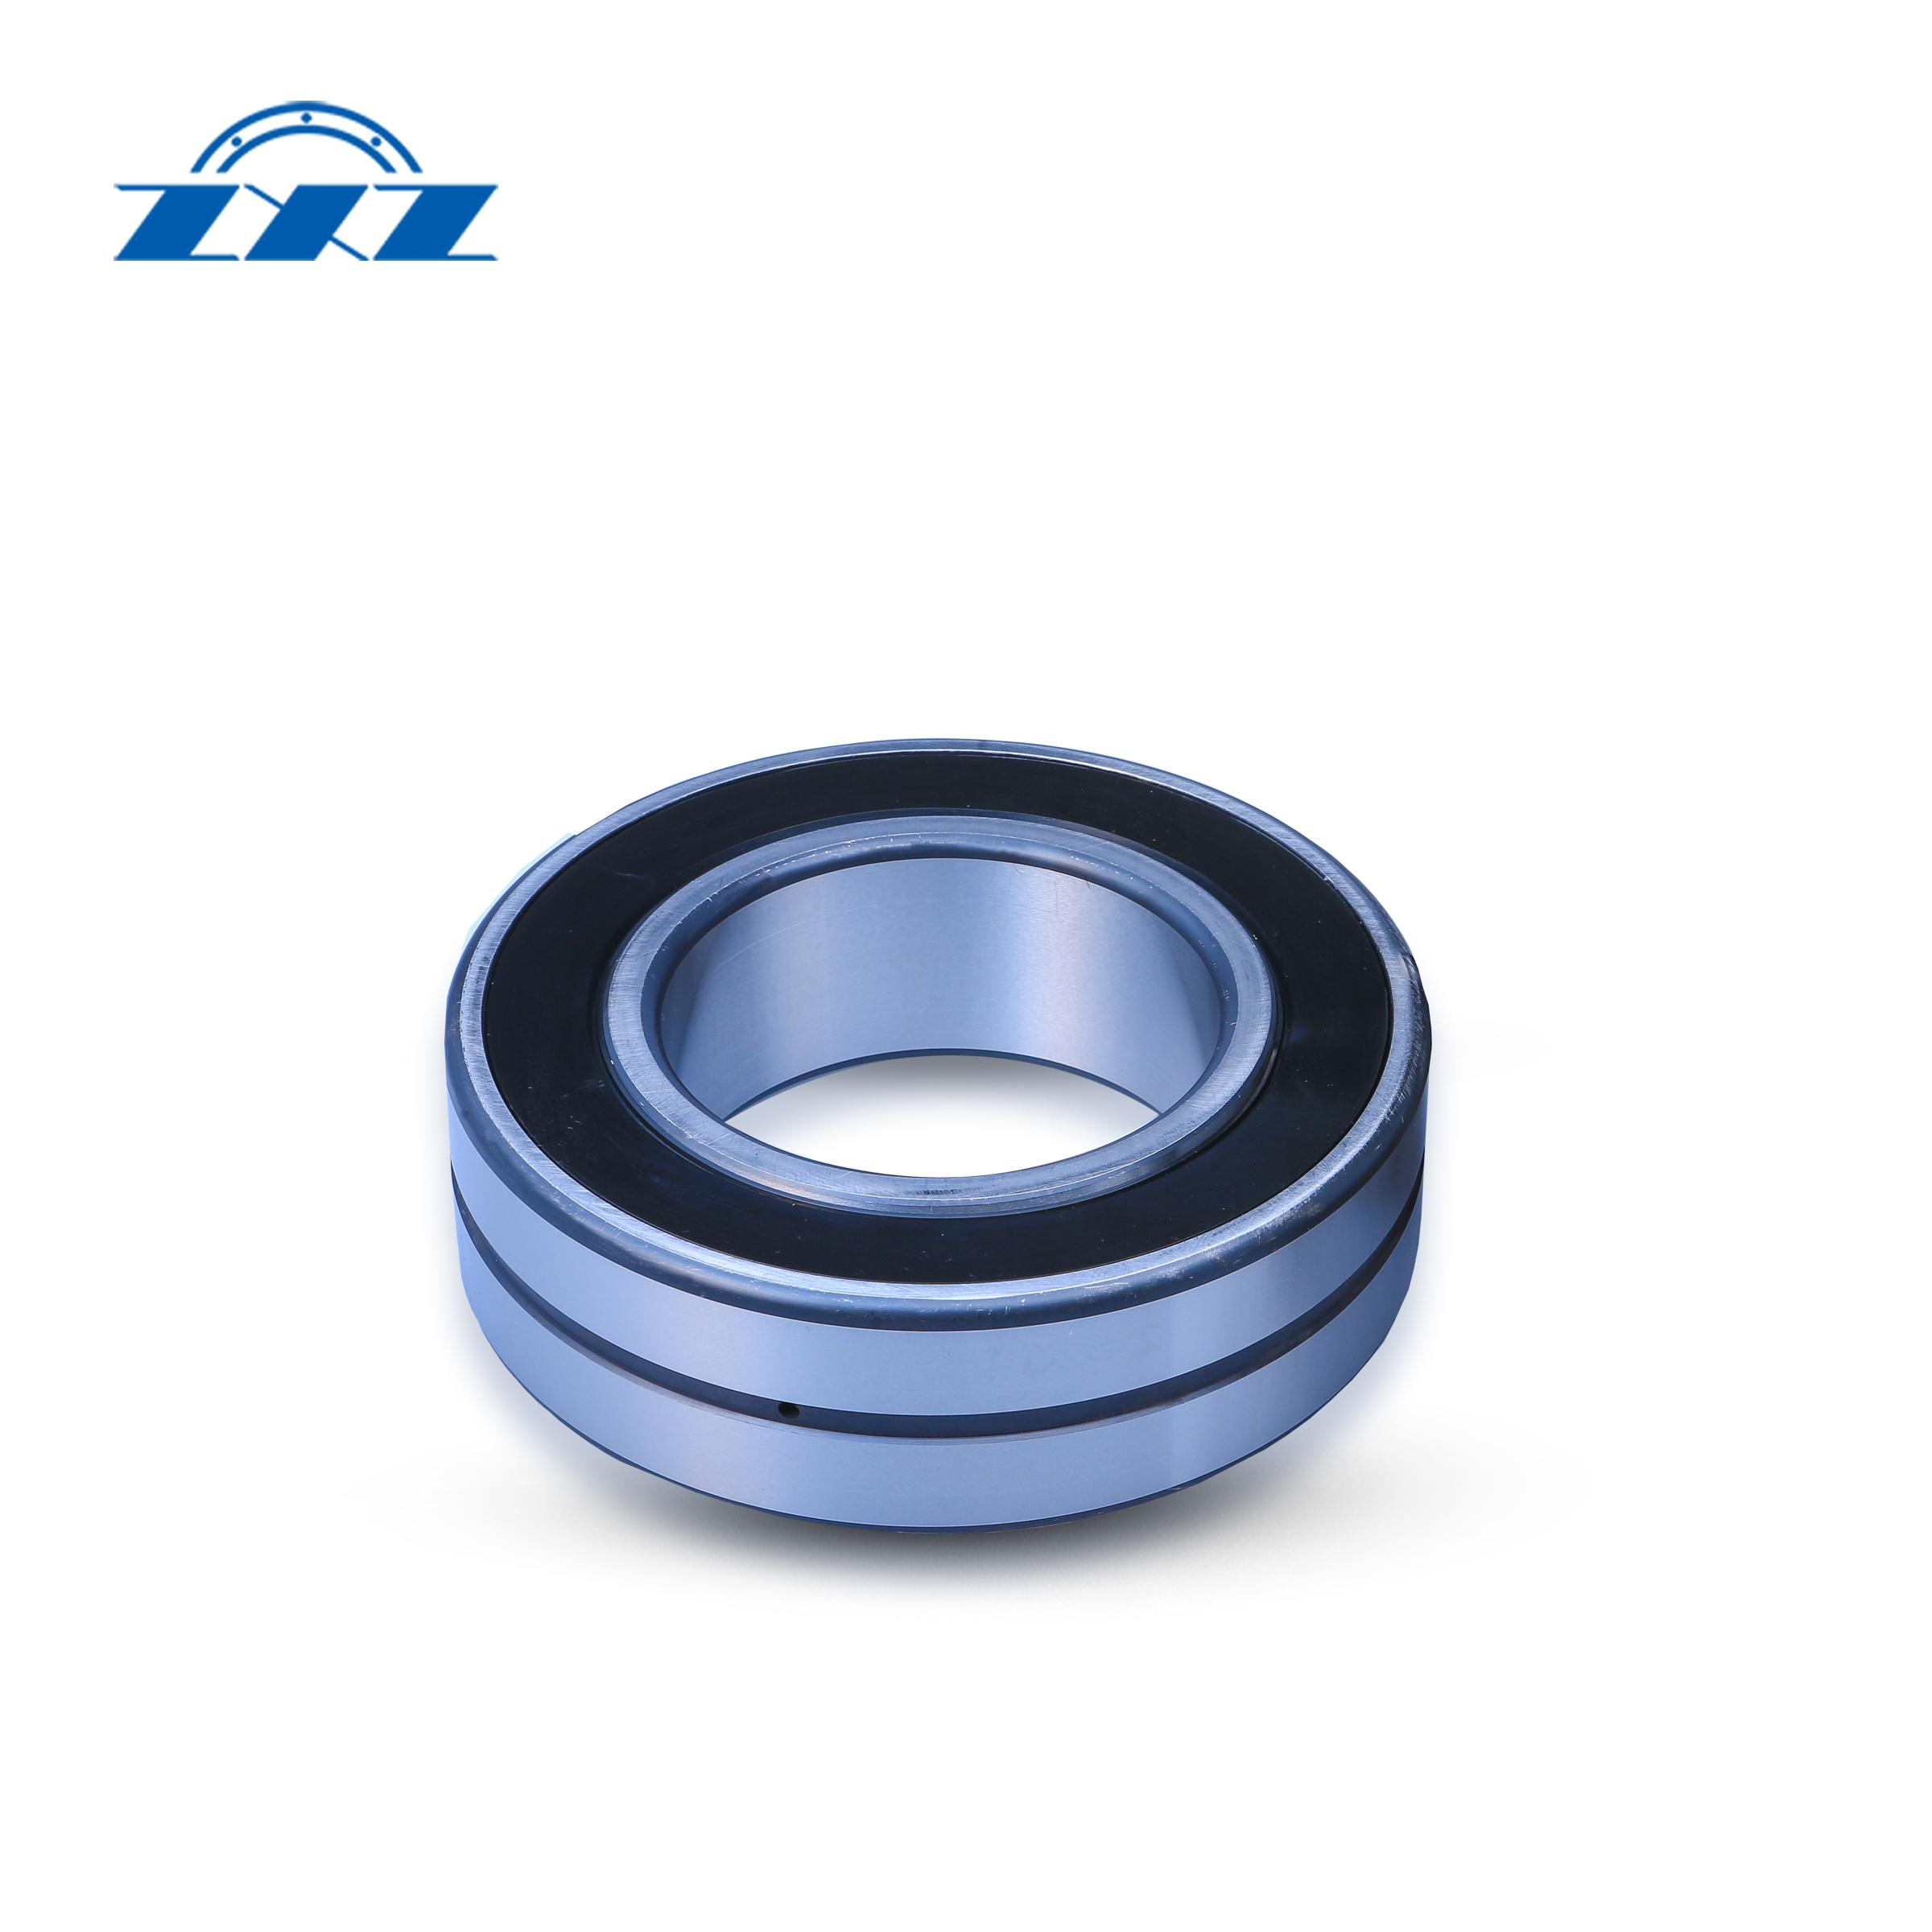 H series self-aligning roller bearings